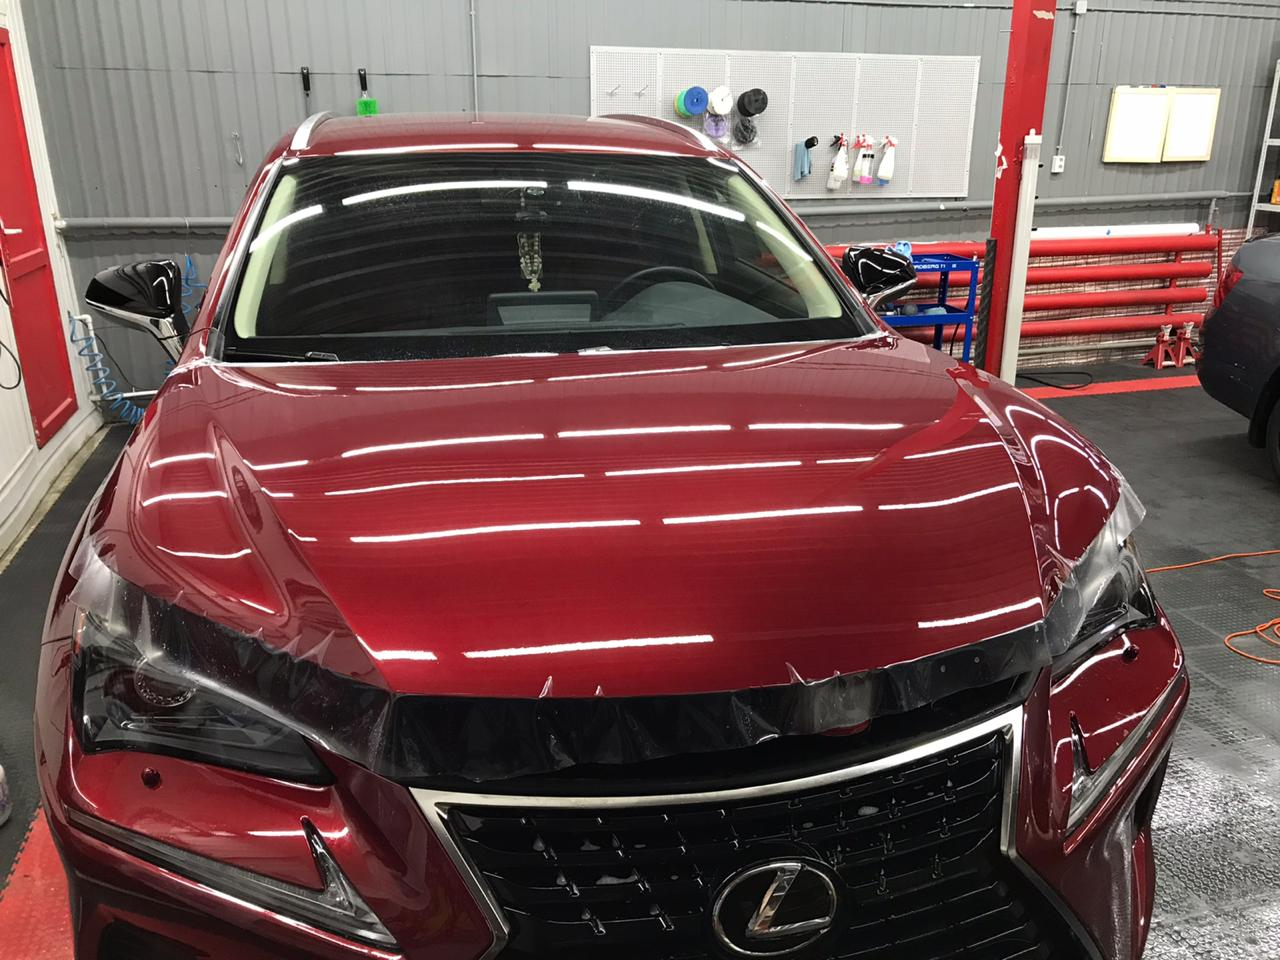 Lexus: Установка антигравийной пленки The Ultimate PPF с эффектом самовосстановления царапин и затертостей от тепла